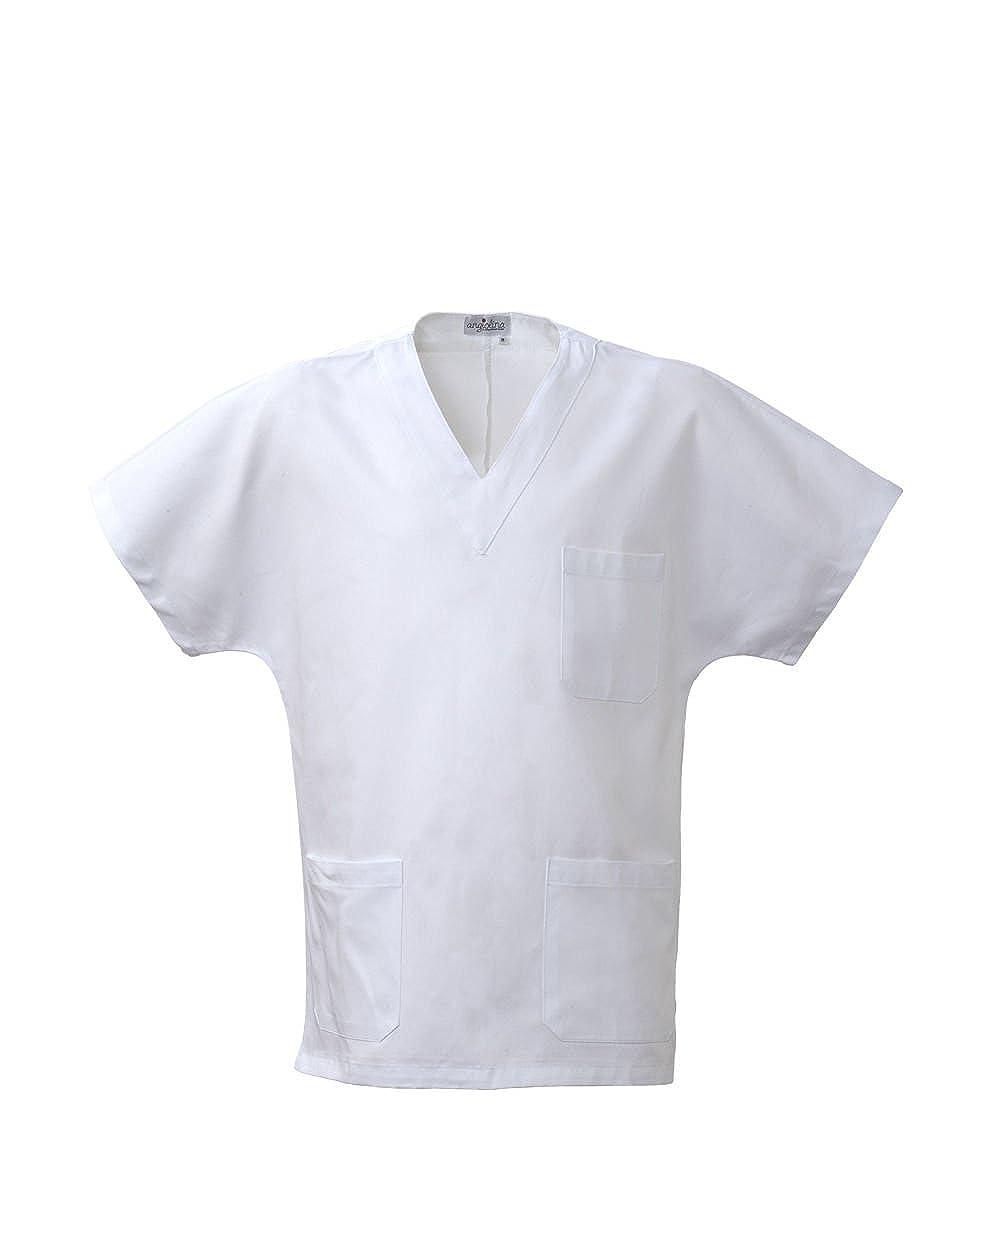 Pantalone Medico Uomo Donna Ospedale Infermiere Dentista Bianco Angiolina